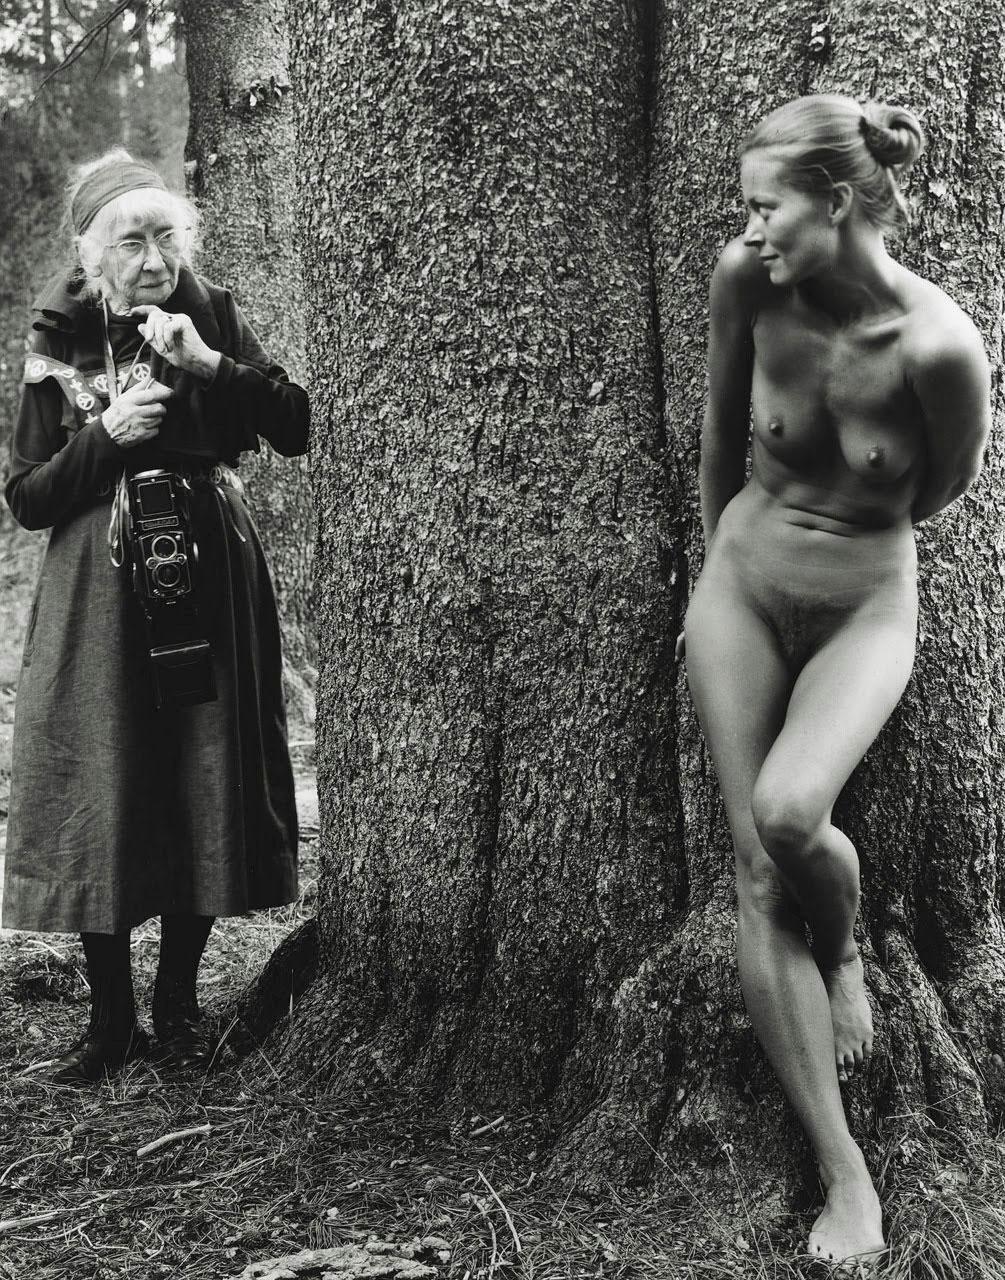 Fotó: Judy Dater: Imogen Cunningham és Twinka Thiebaud, 1974